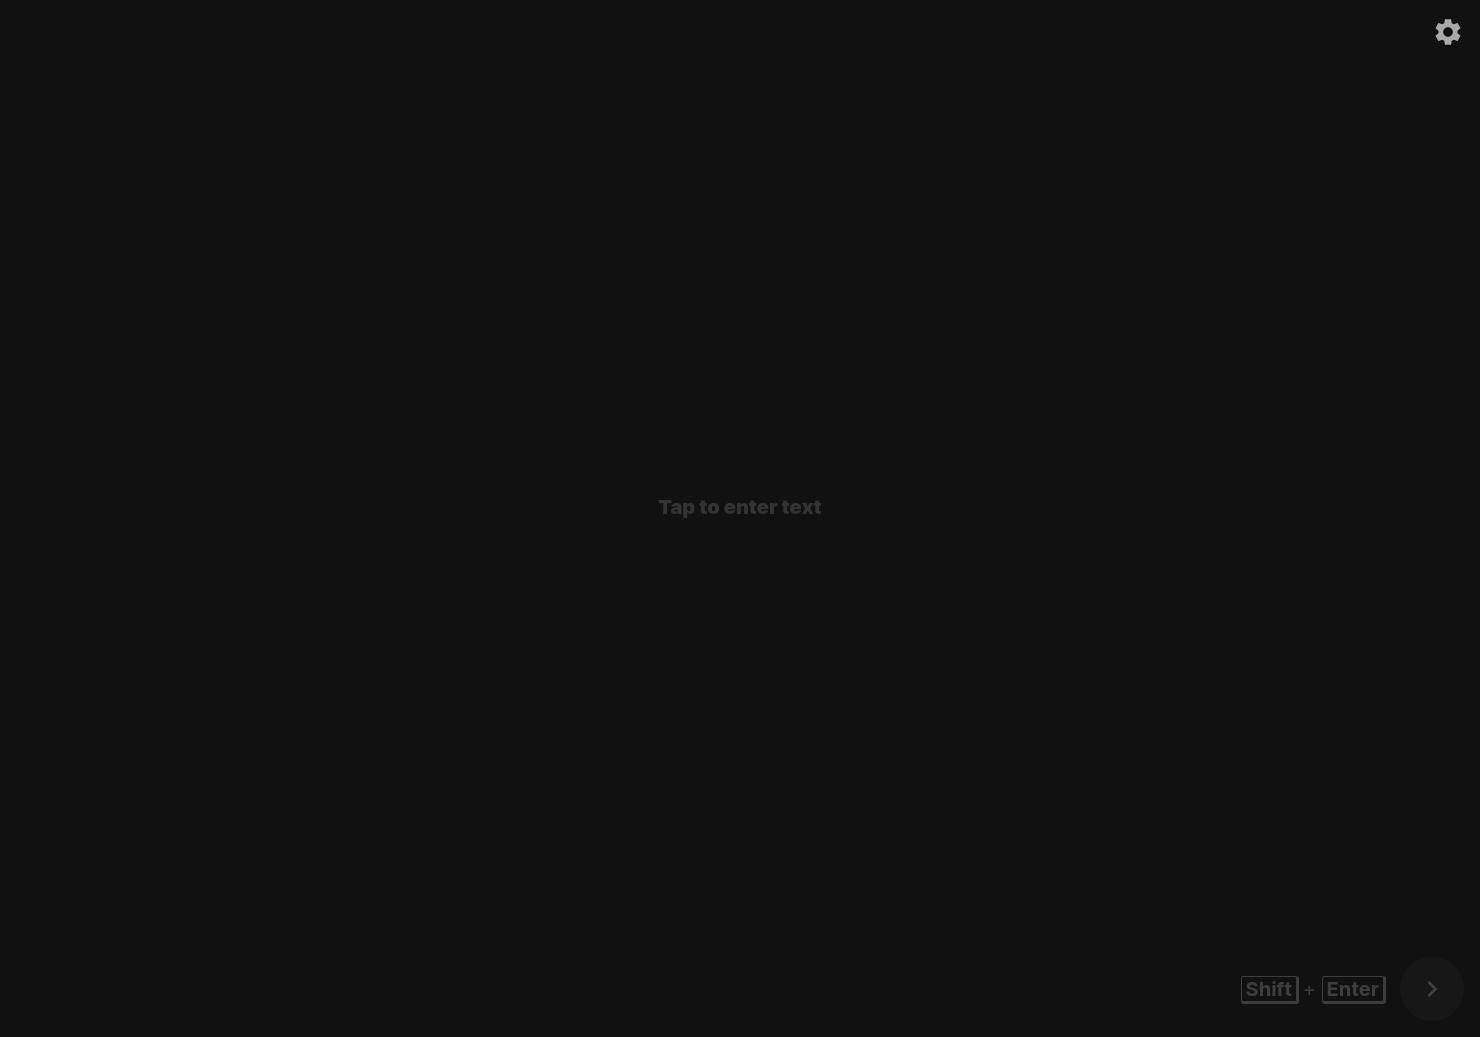 ?max width=300&url=https%3a%2f%2fsnackthis